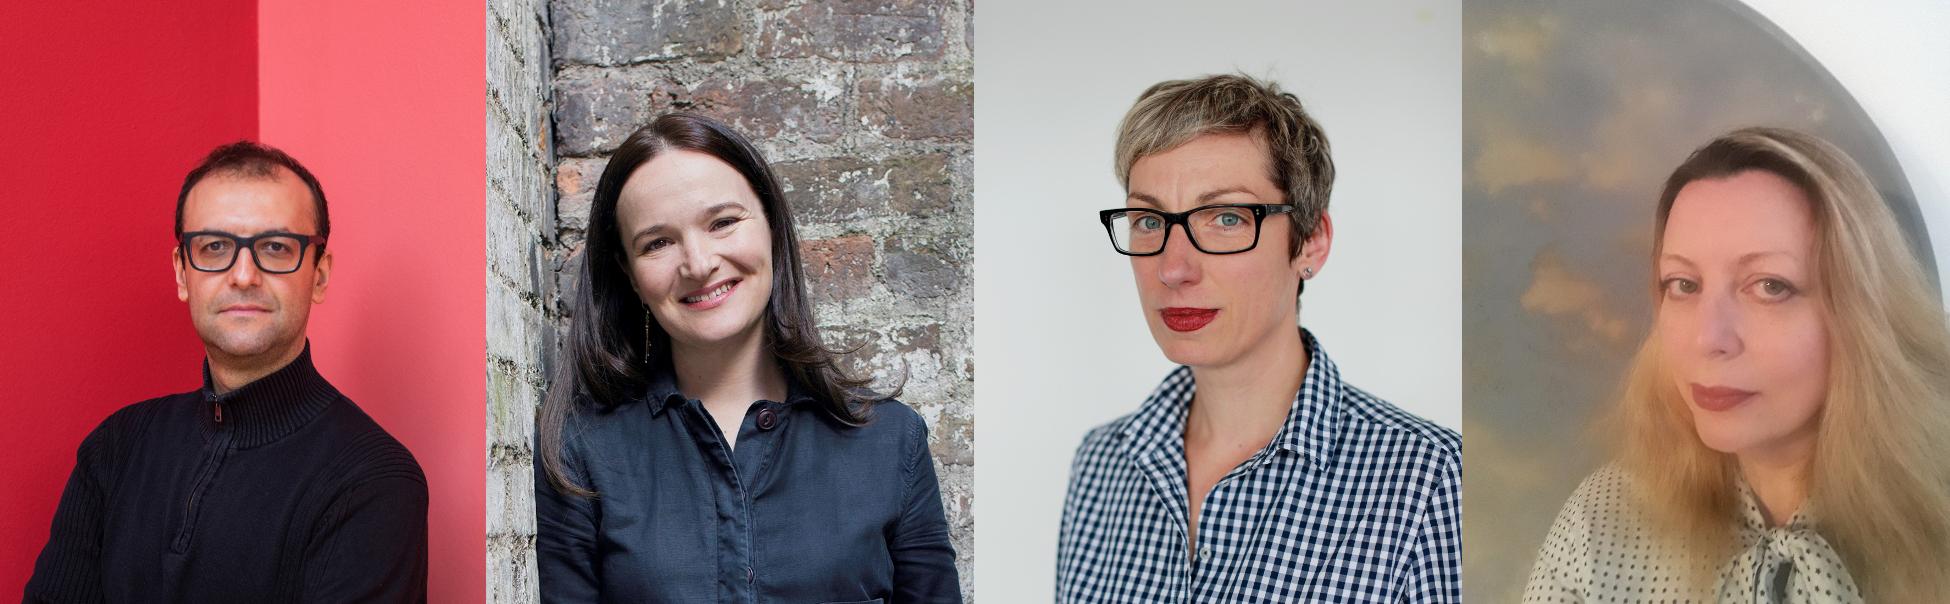 Headshots of four curators